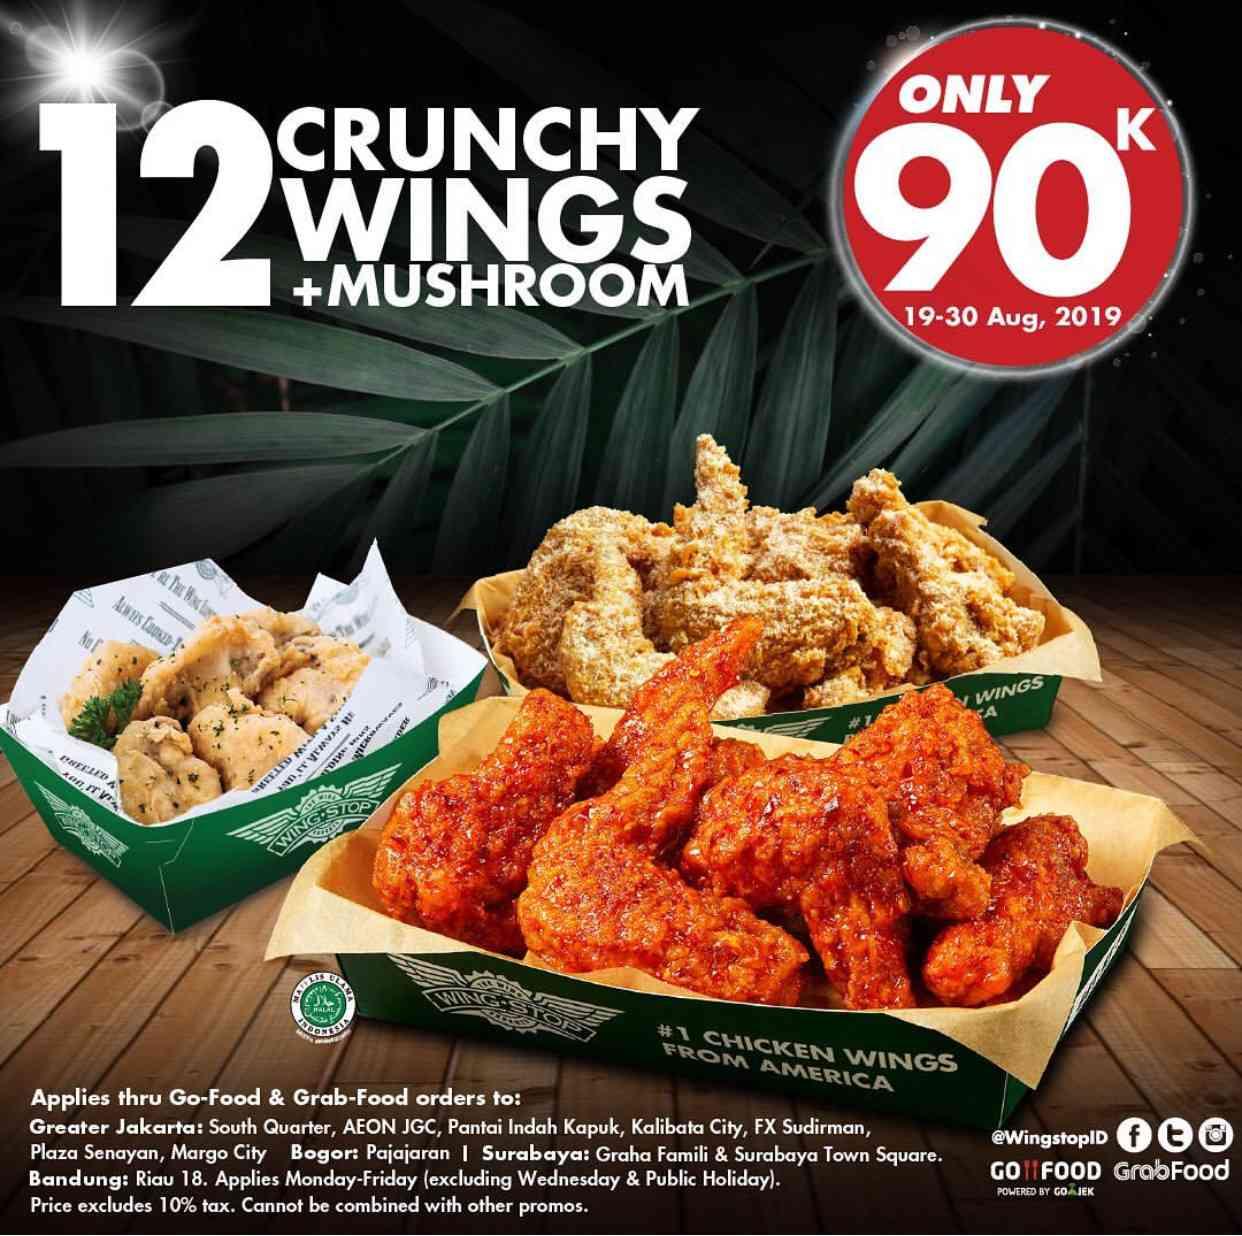 Diskon Wingstop Get 12 Crunchy Wings + Mushroom Fritters For Only 90K!